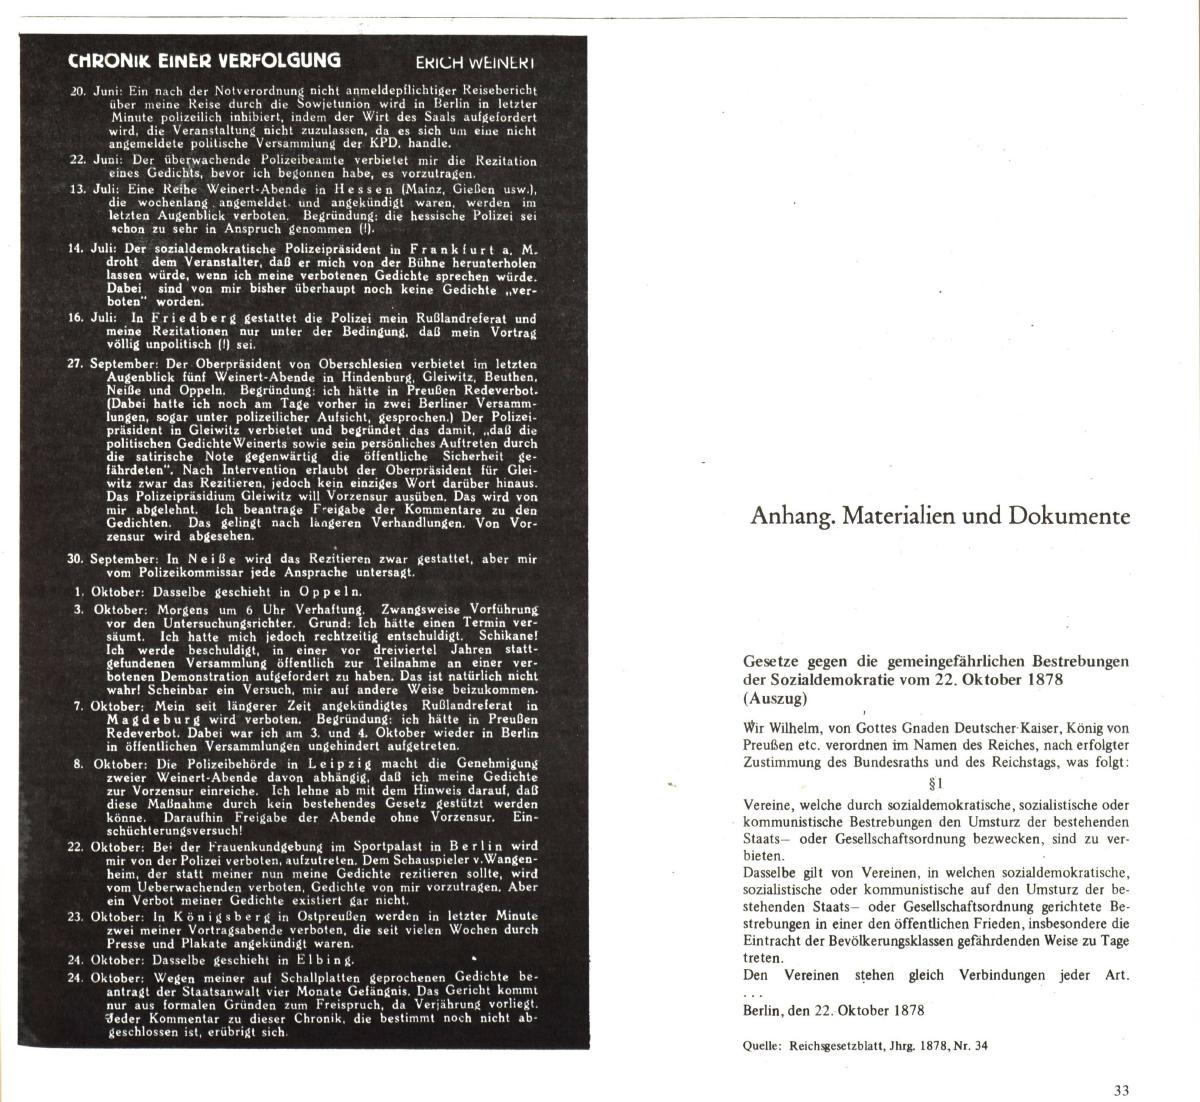 REP_VLB_1976_Die_Zensurgesetze_34